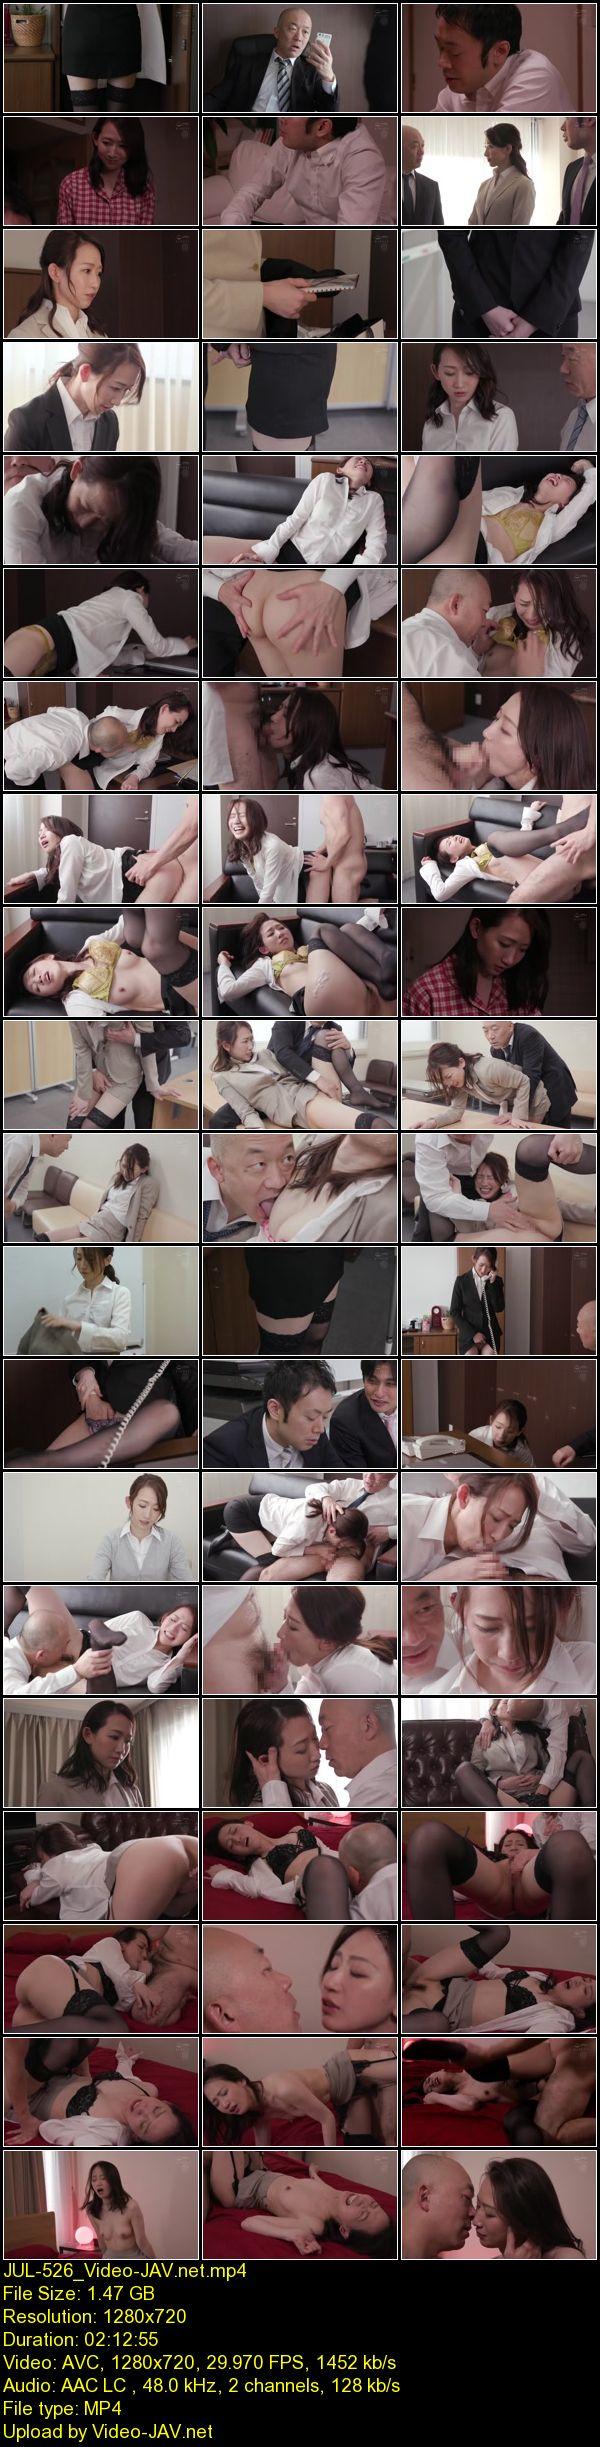 JAV Download Kana Mito [JUL 526] 人妻オフィスレディの絶対領域 貞淑妻を襲う、部長の言いなり社内羞恥―。 水戸かな 2021 04 07